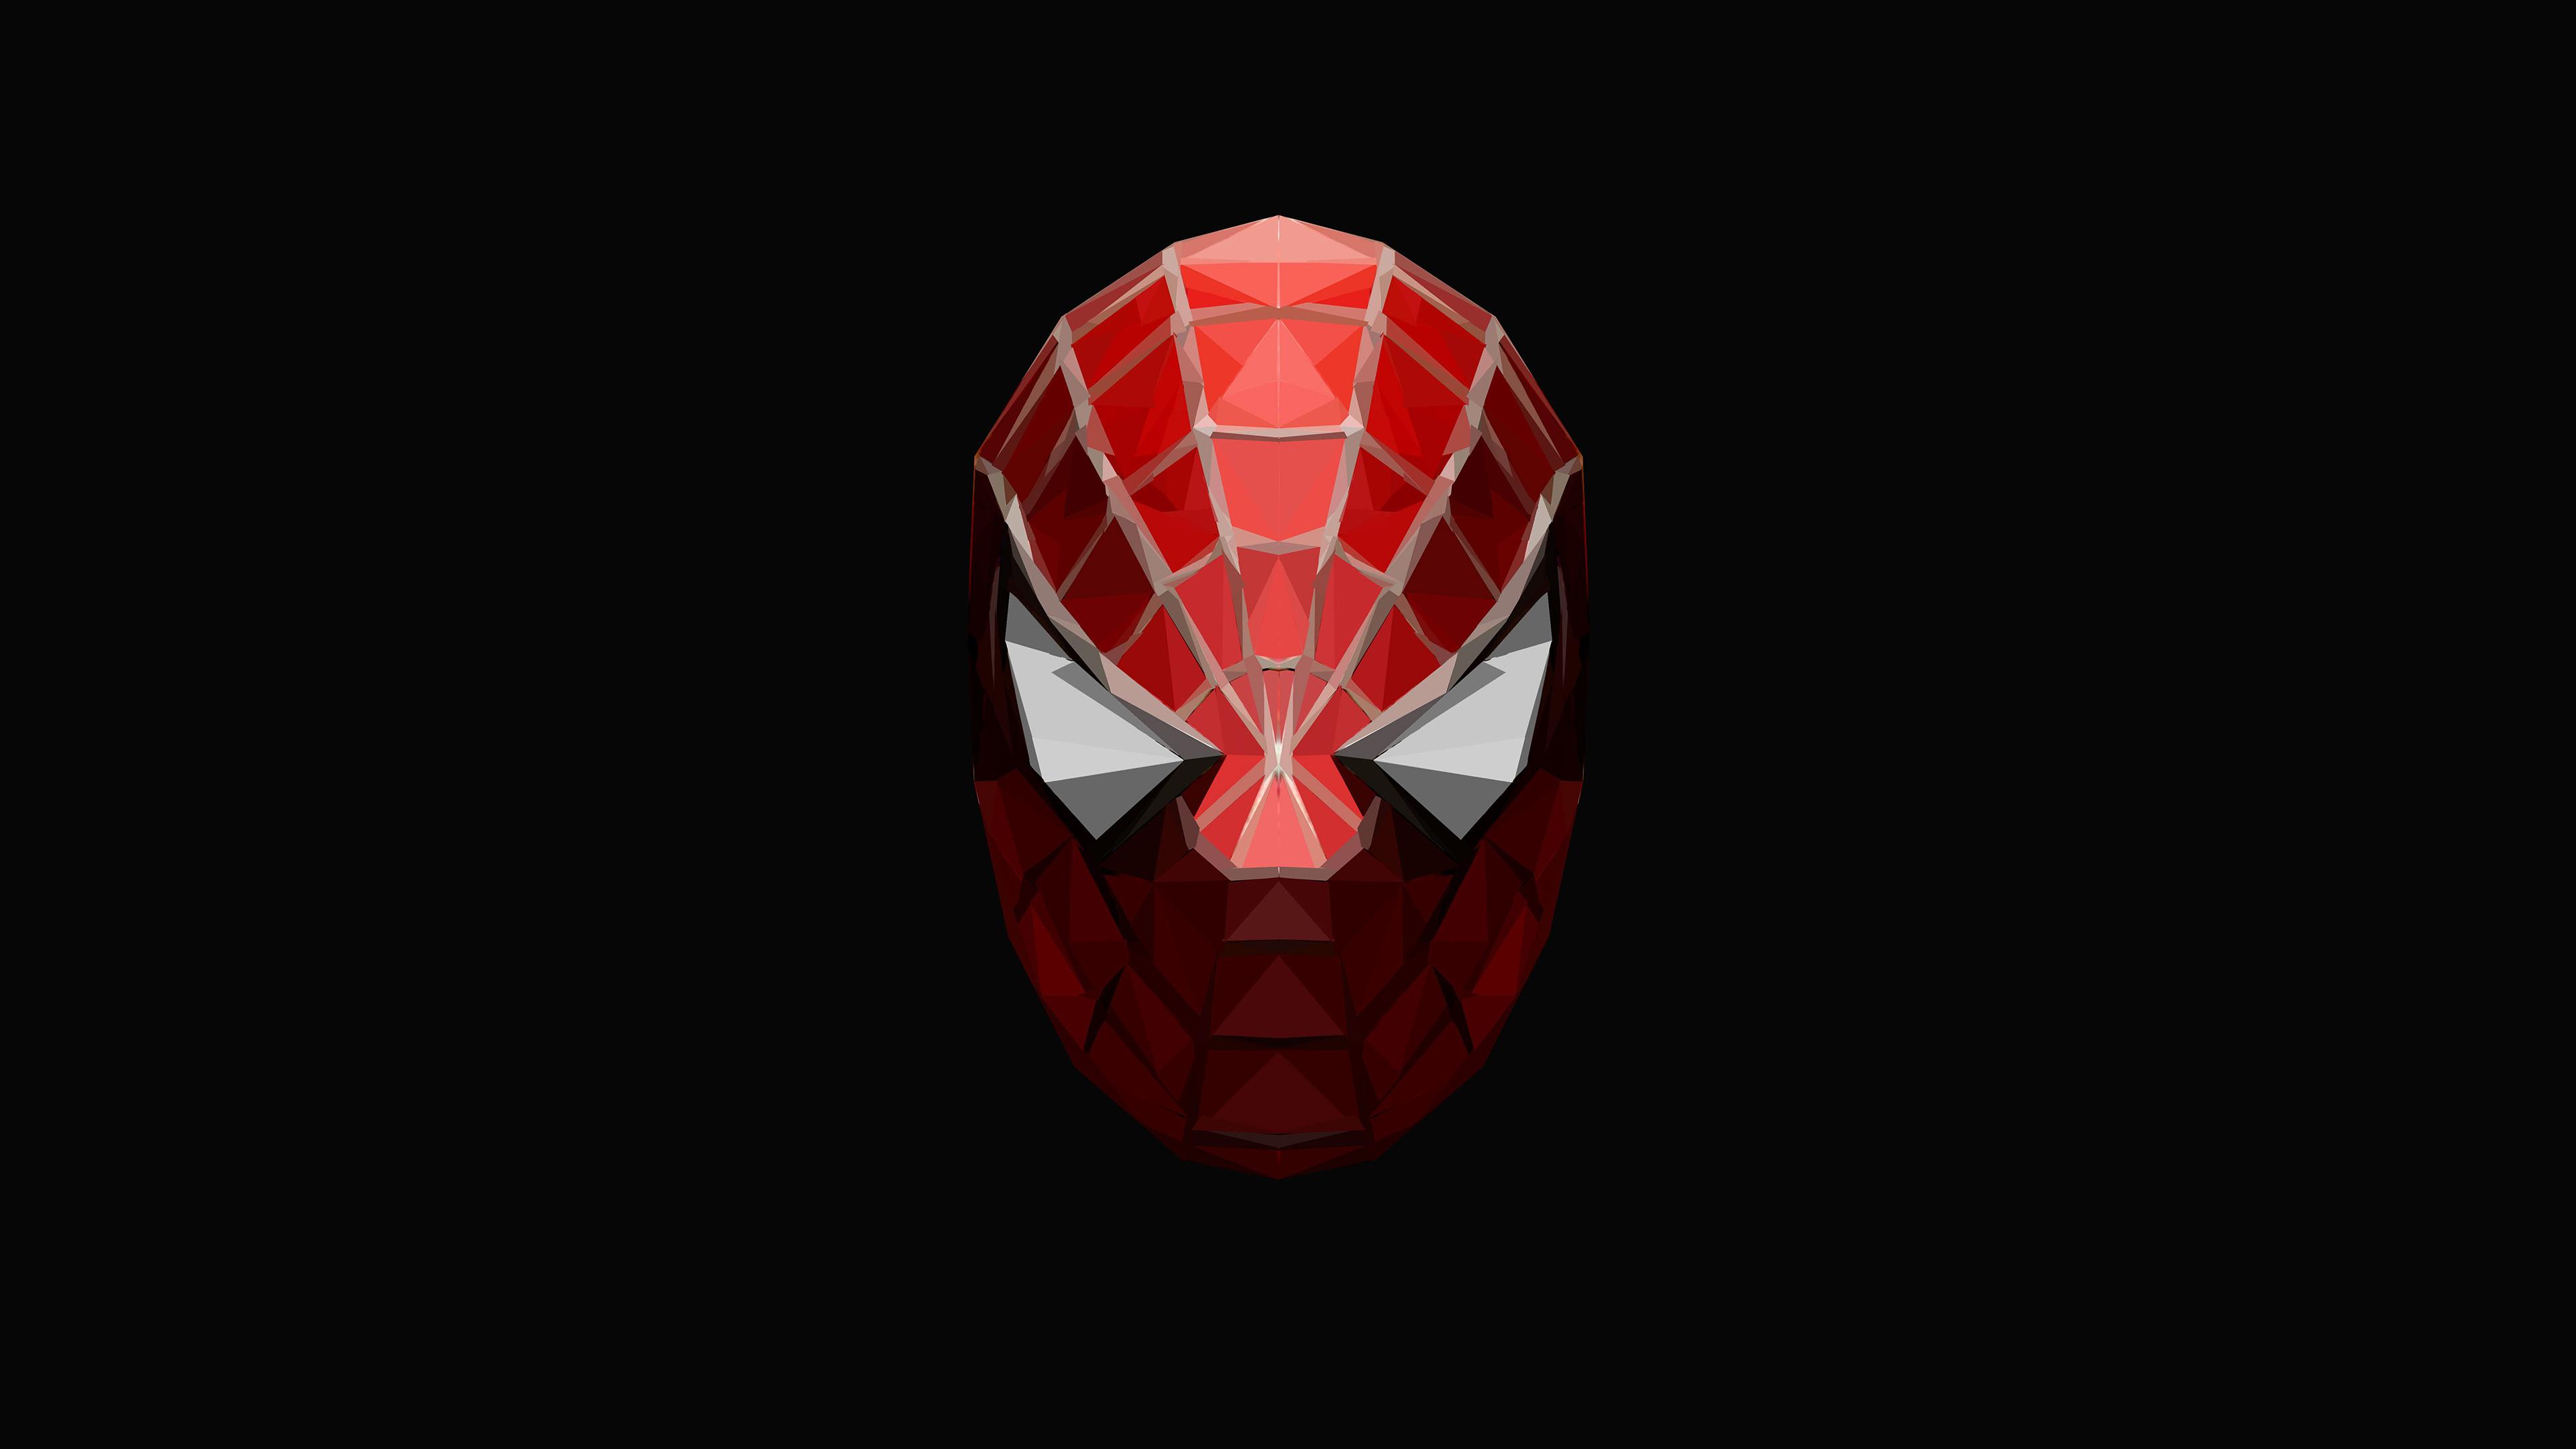 spiderman low poly art 4k 1547506404 - Spiderman Low Poly Art 4k - superheroes wallpapers, spiderman wallpapers, low poly wallpapers, hd-wallpapers, digital art wallpapers, behance wallpapers, artwork wallpapers, artist wallpapers, 4k-wallpapers